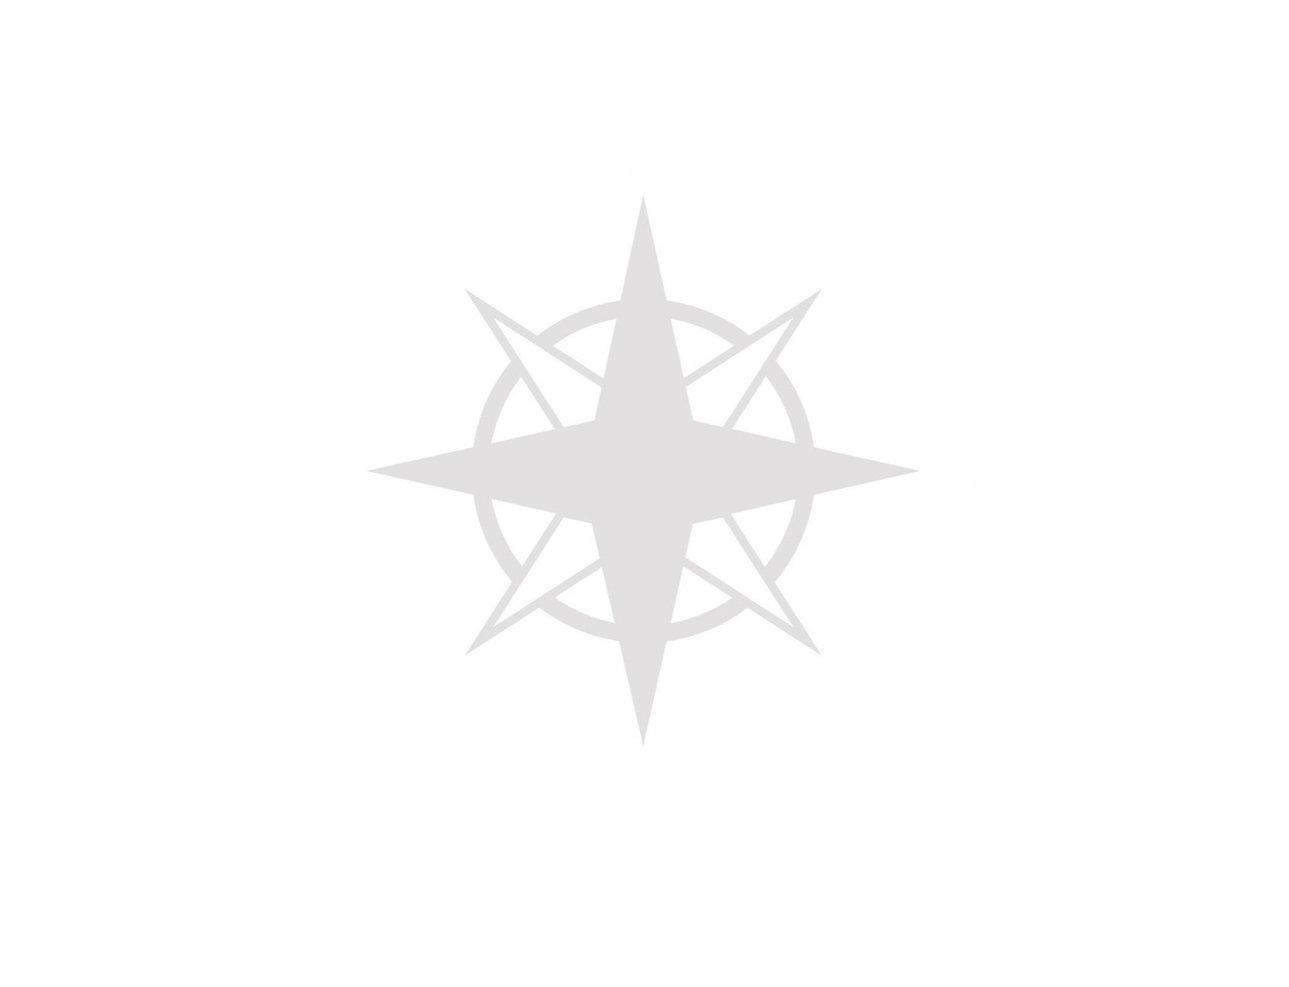 logo%20website_edited_edited_edited_edited_edited_edited_edited_edited_edited.jpg